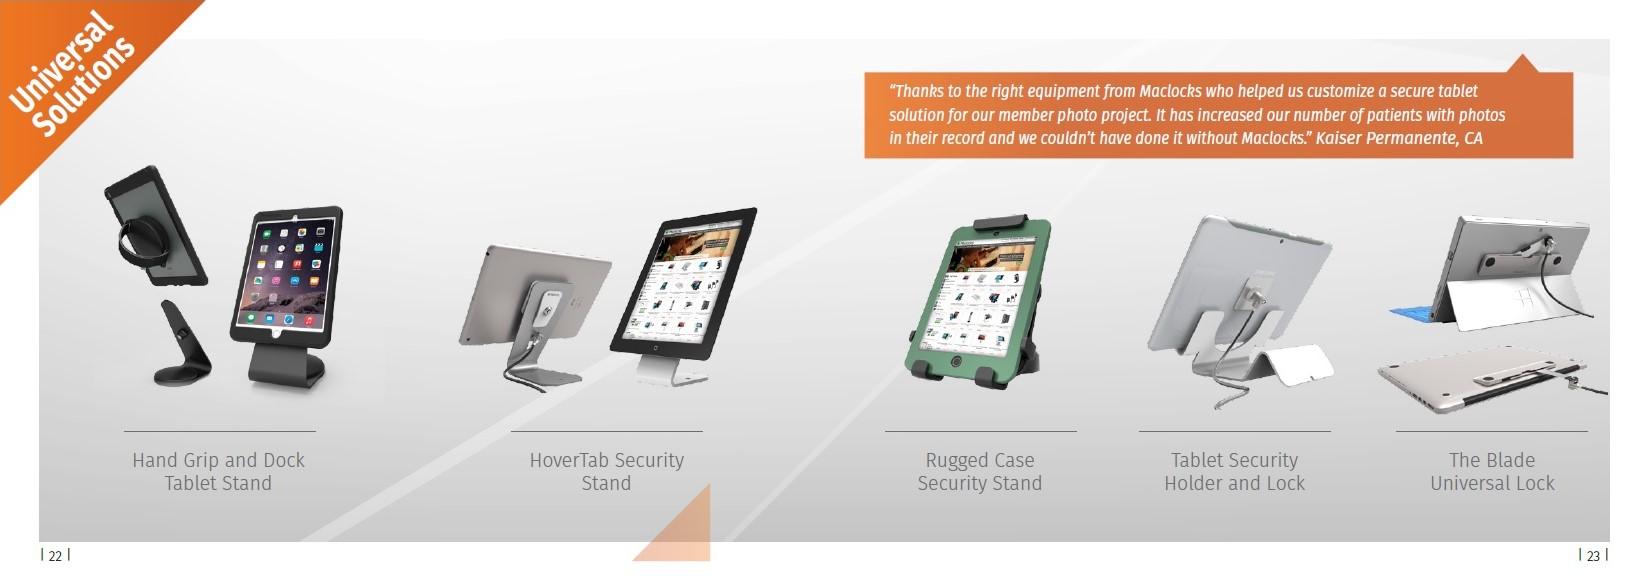 JTL Technology | Maclocks iPad Kiosk | Huion | Sonnet